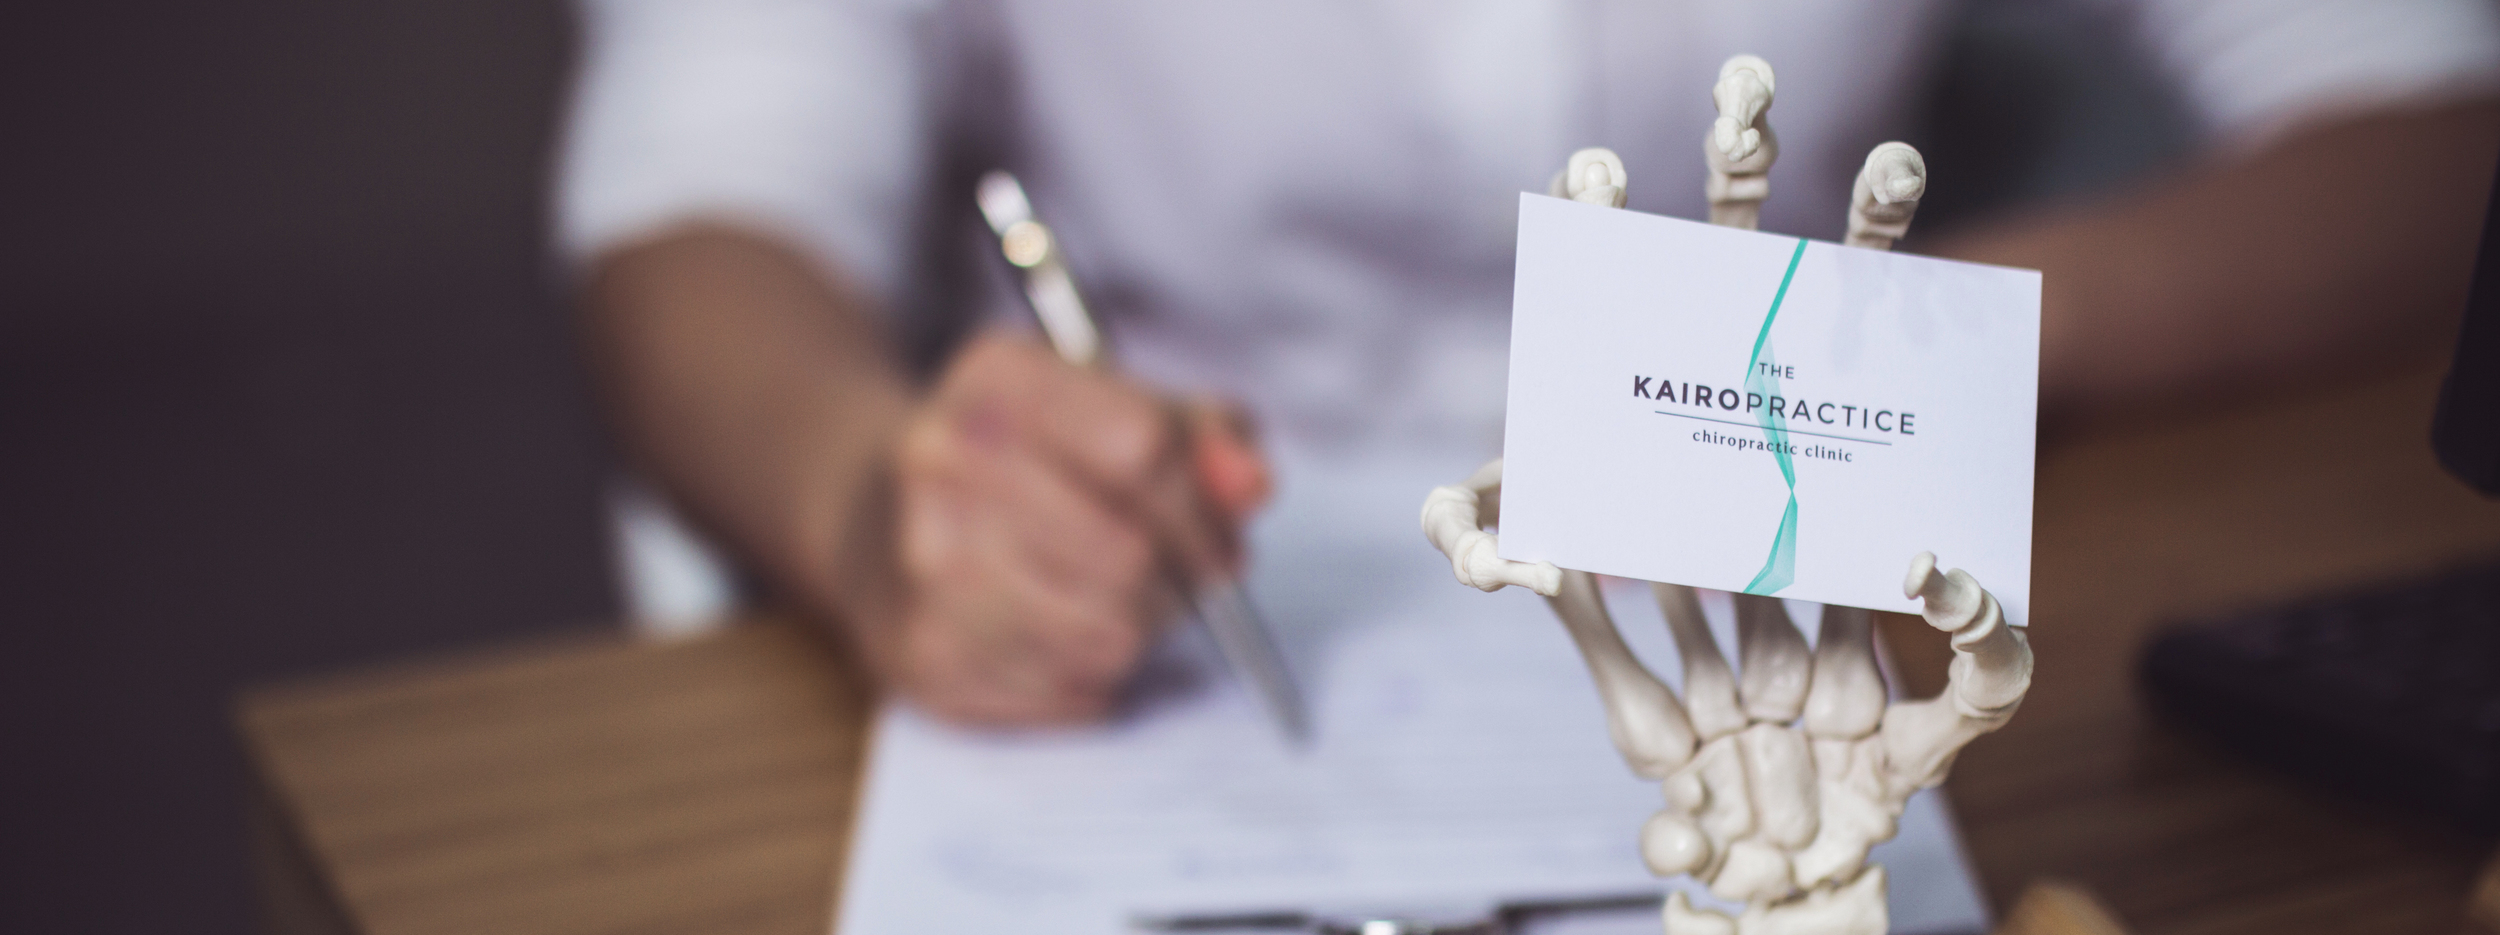 The Kairo Practice (Singapore Chiropractic Clinic)